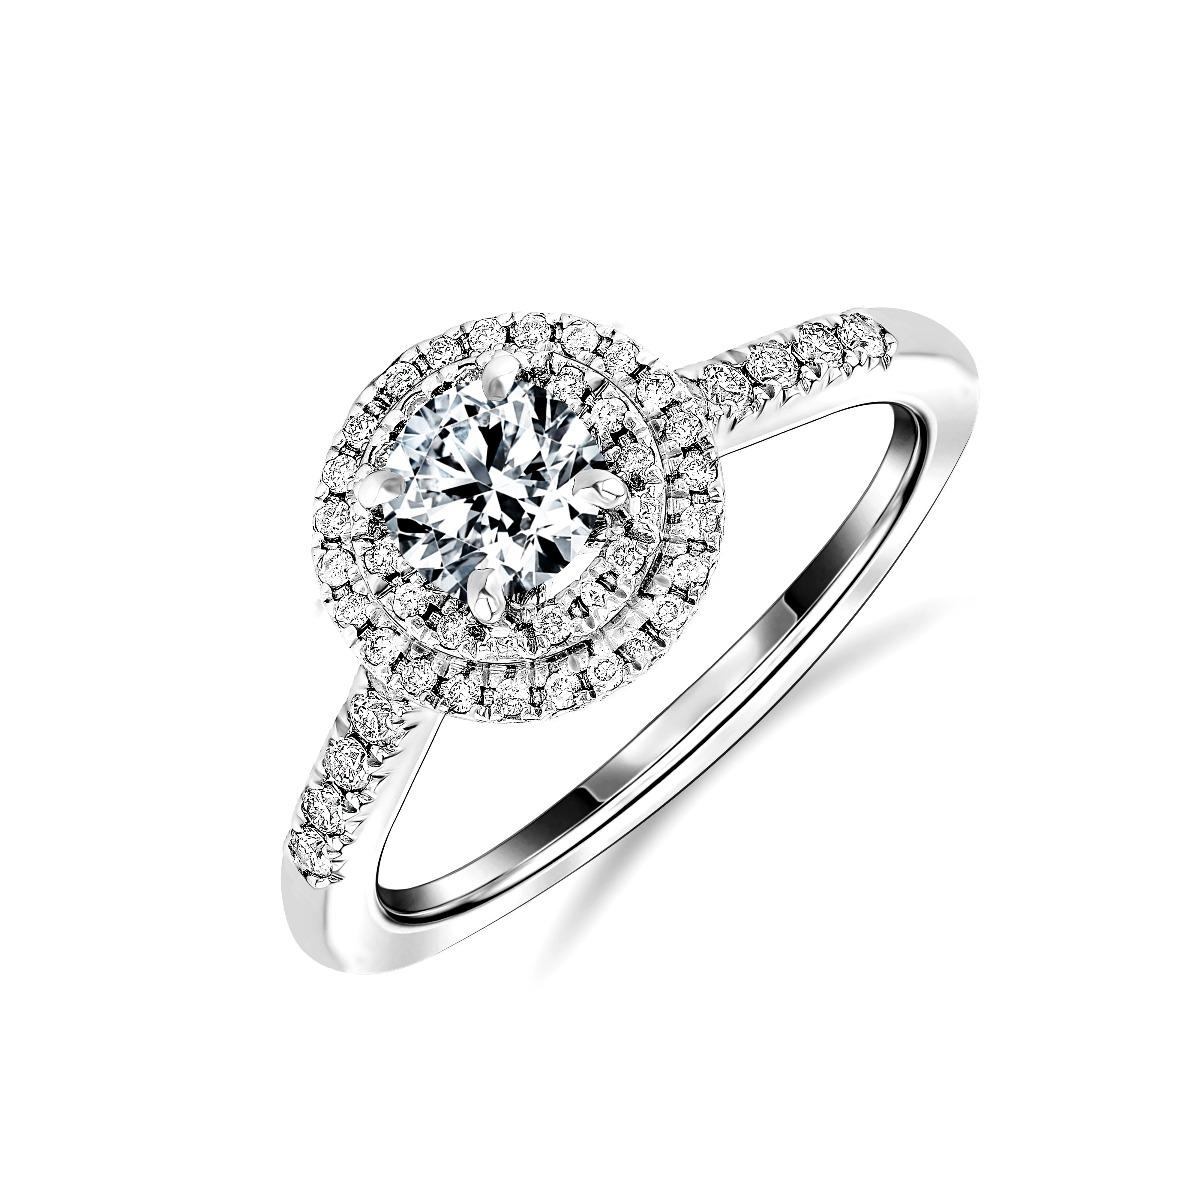 1.33ct Peony Halo | Round Cut Diamond Double Halo Engagement Ring | Platinum